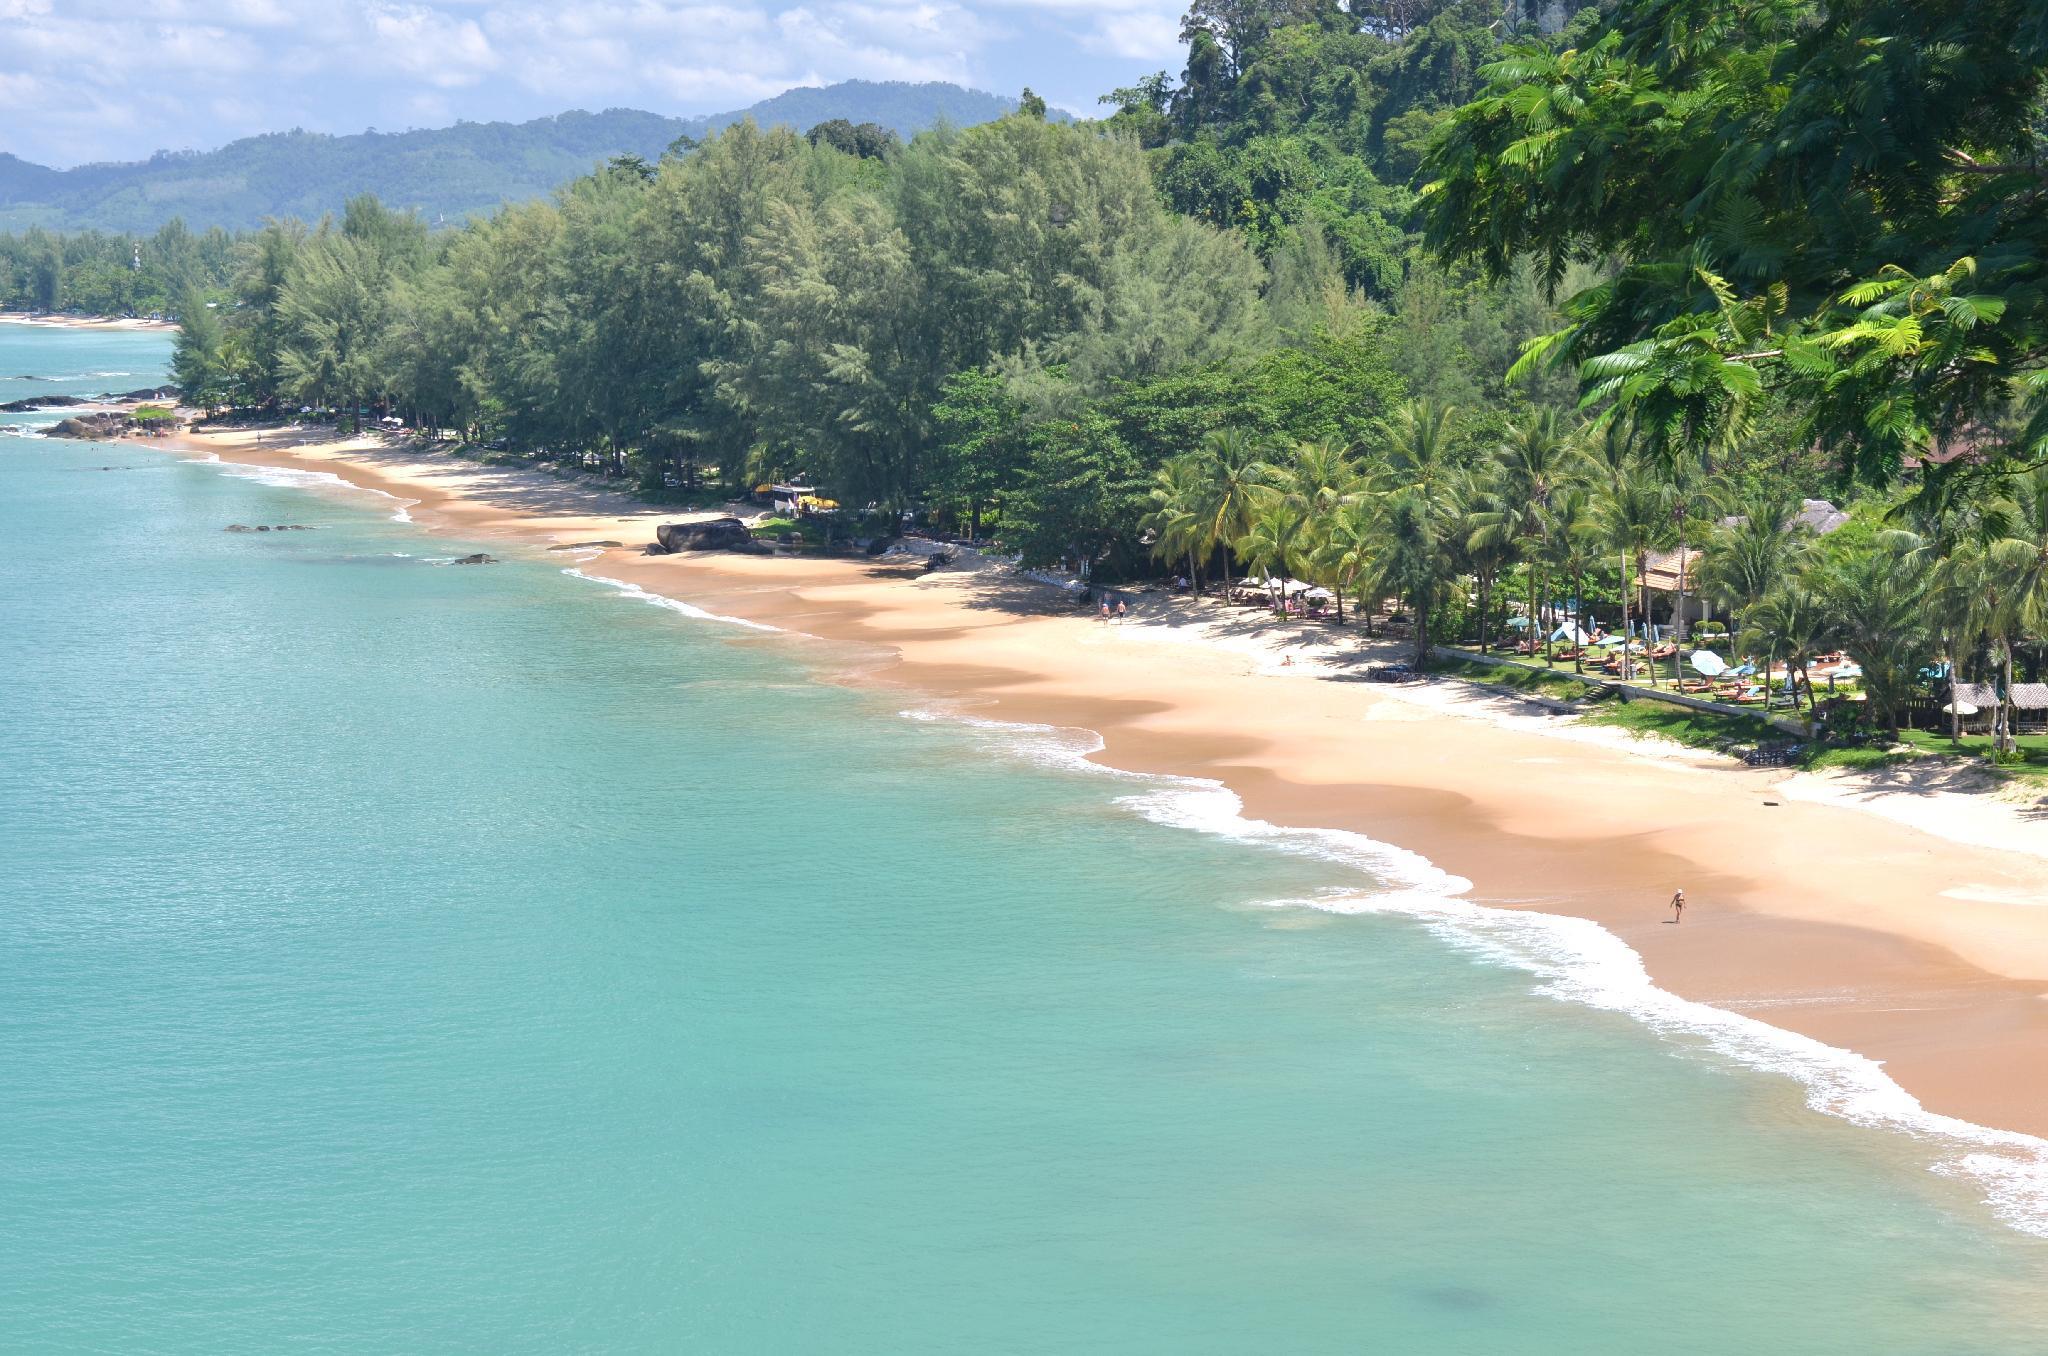 Sofitel Magic Lagoon Resort, Takua Pa